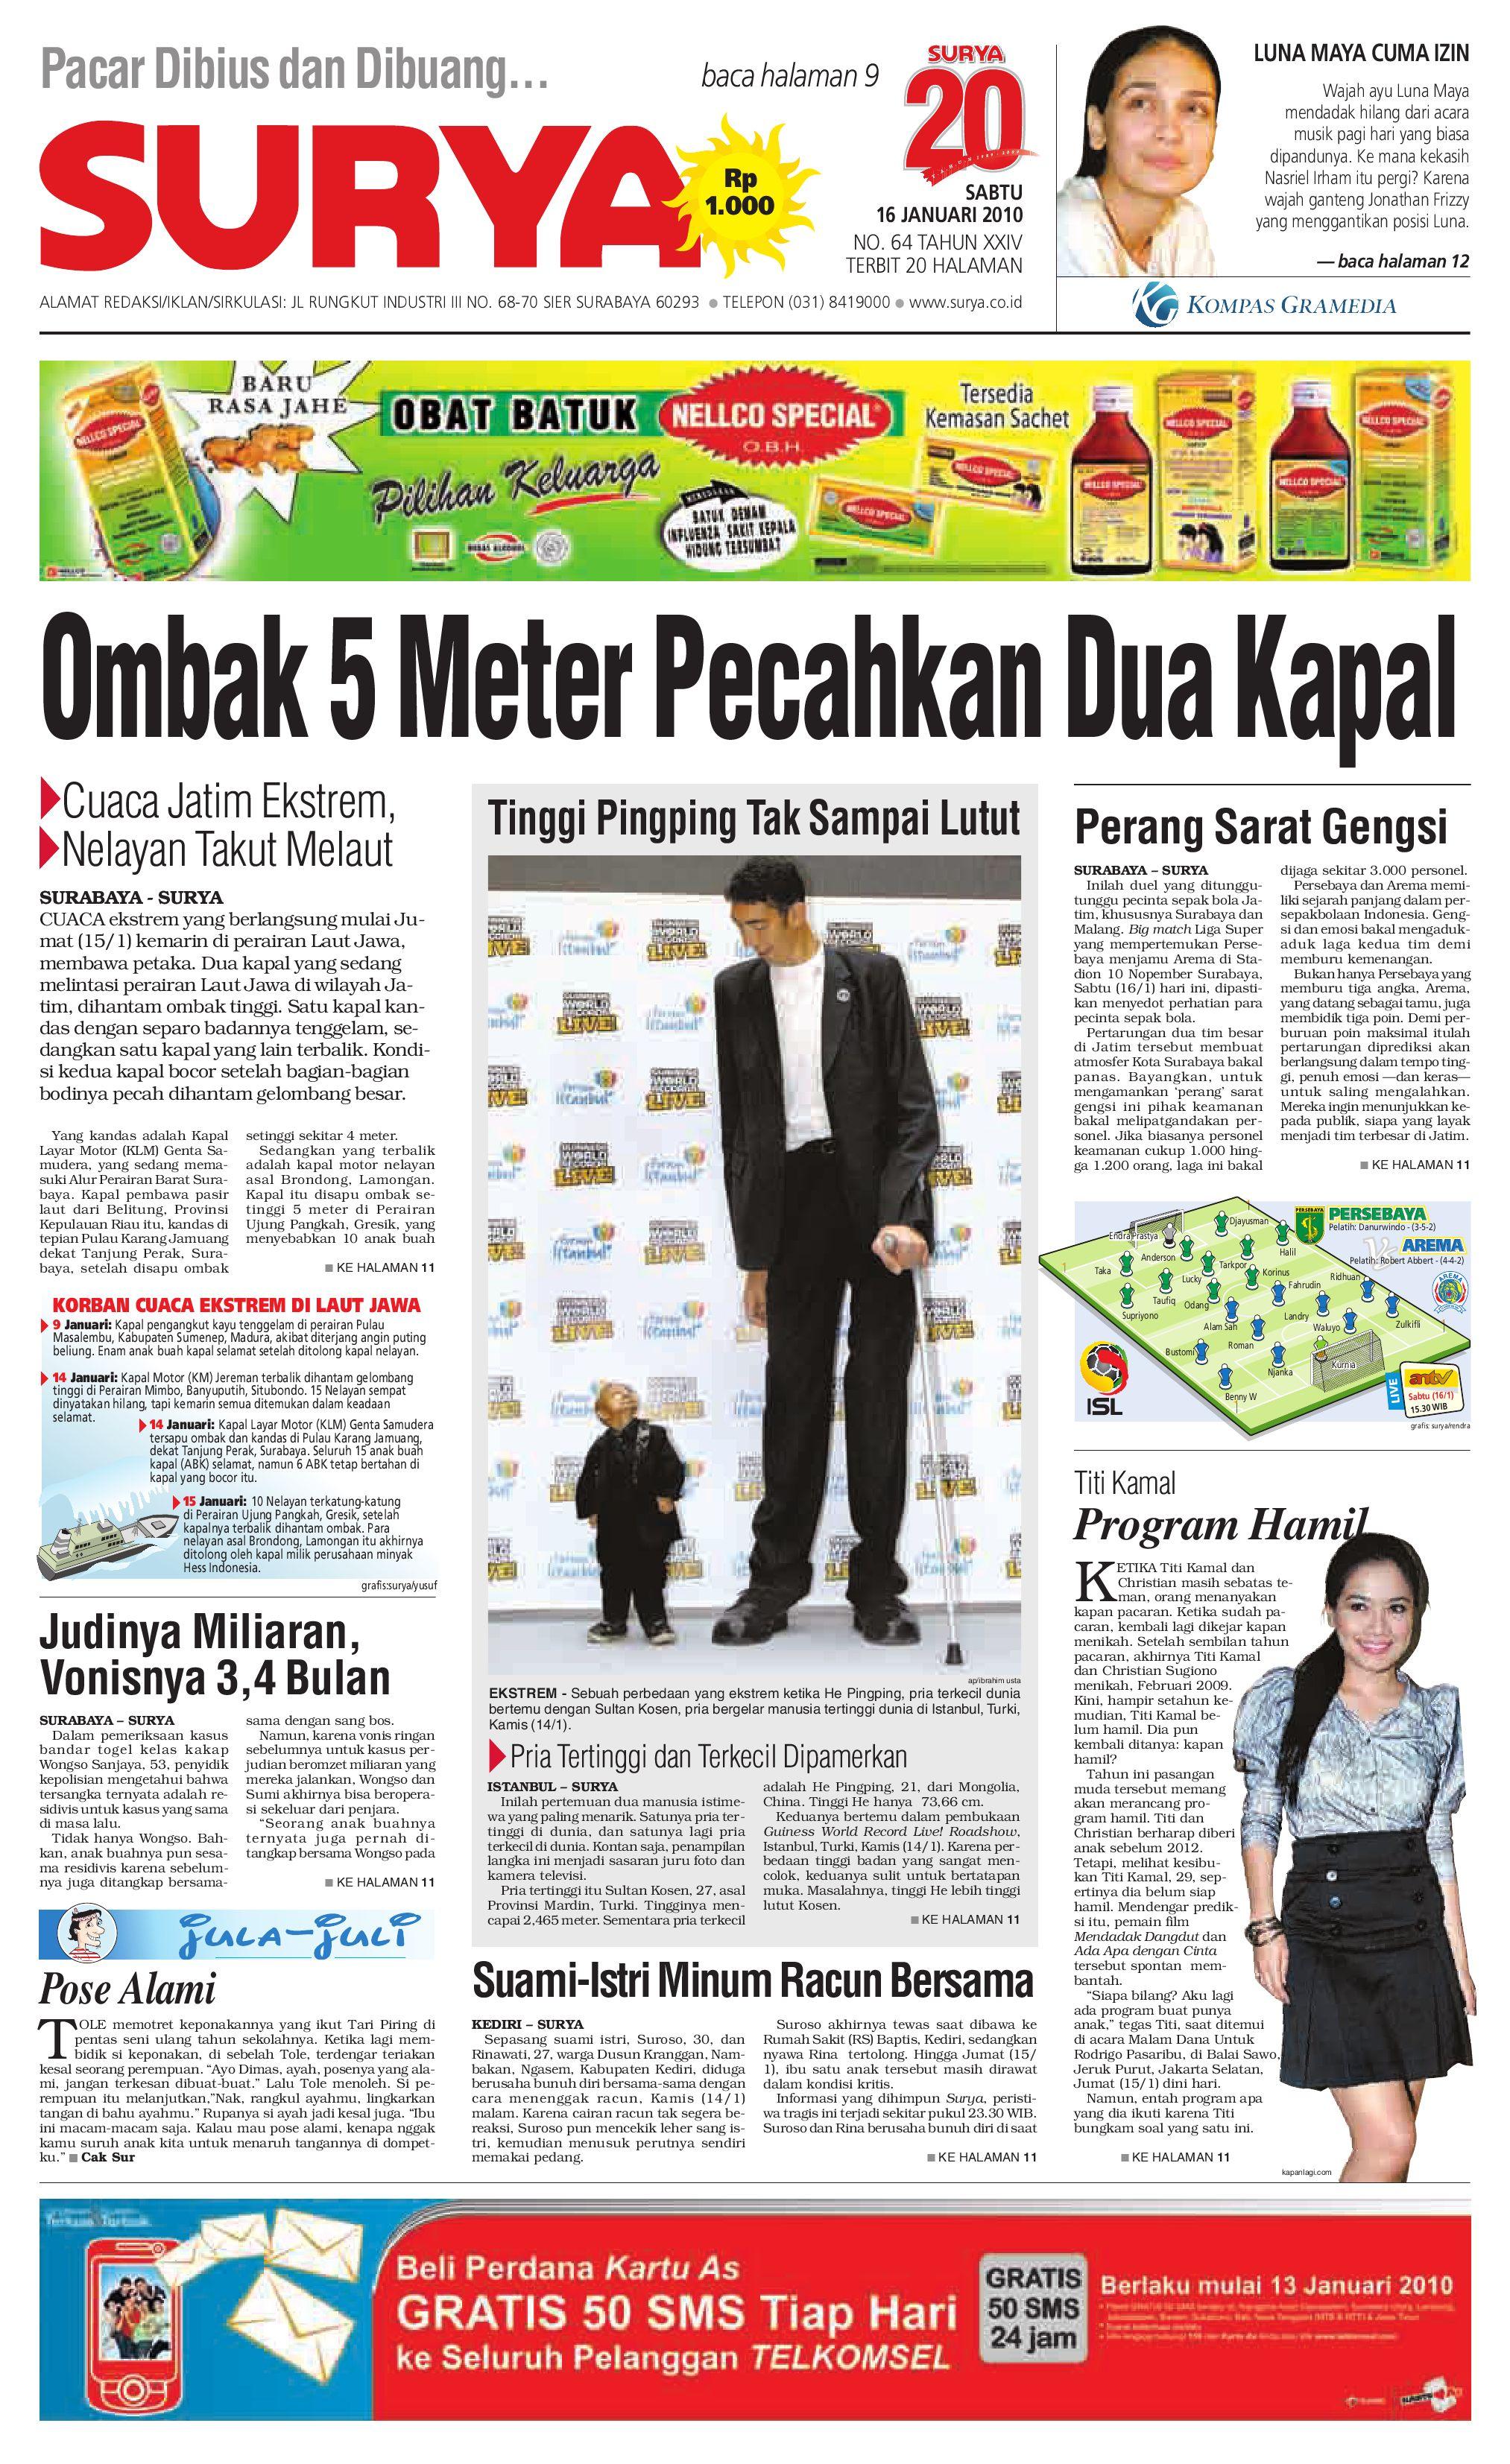 surya edisi cetak 23 mei 2009 by harian surya issuu